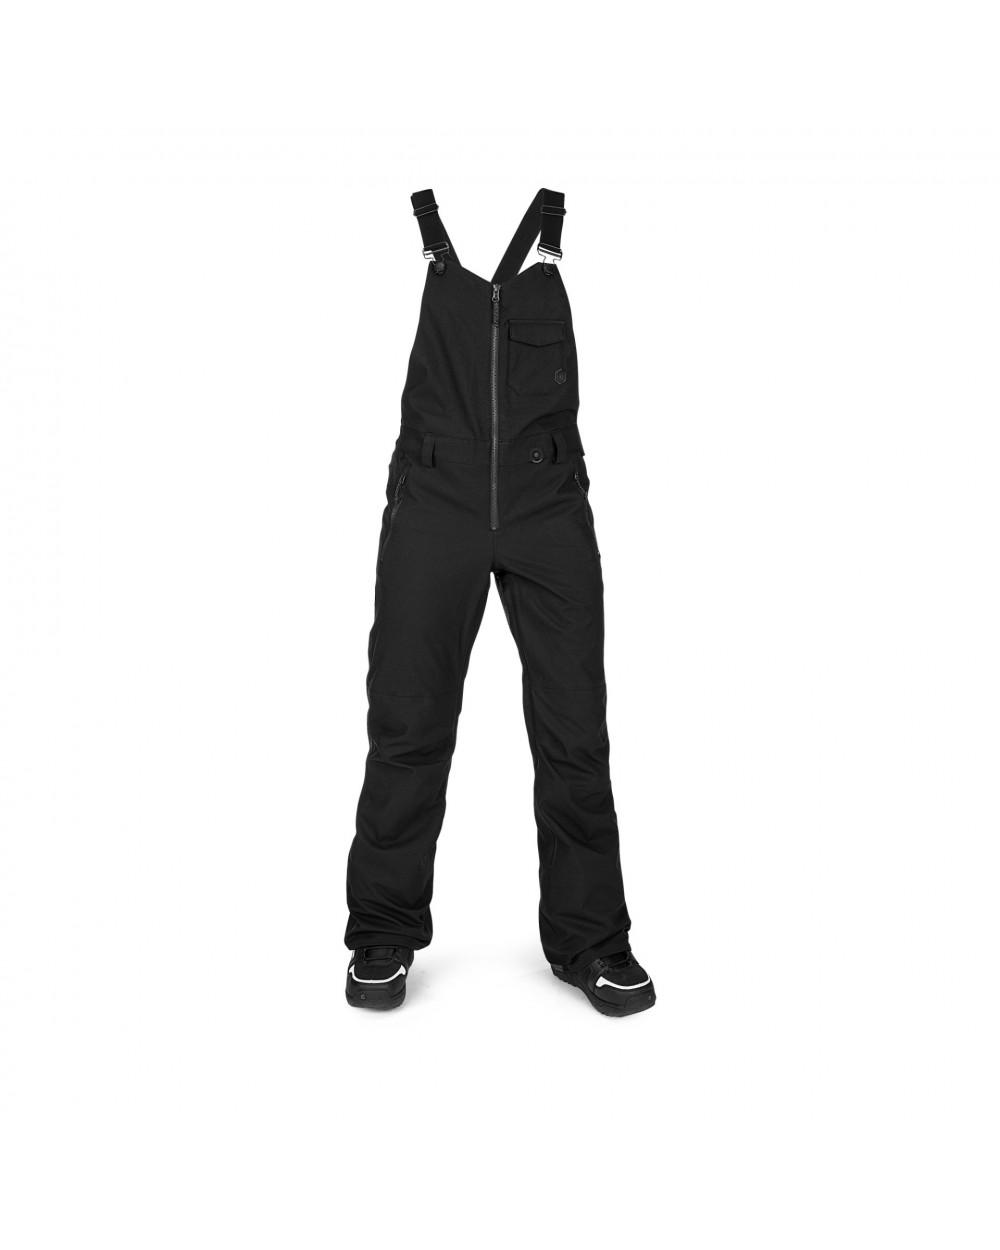 Volcom Snow Swift Bib Overall - Black